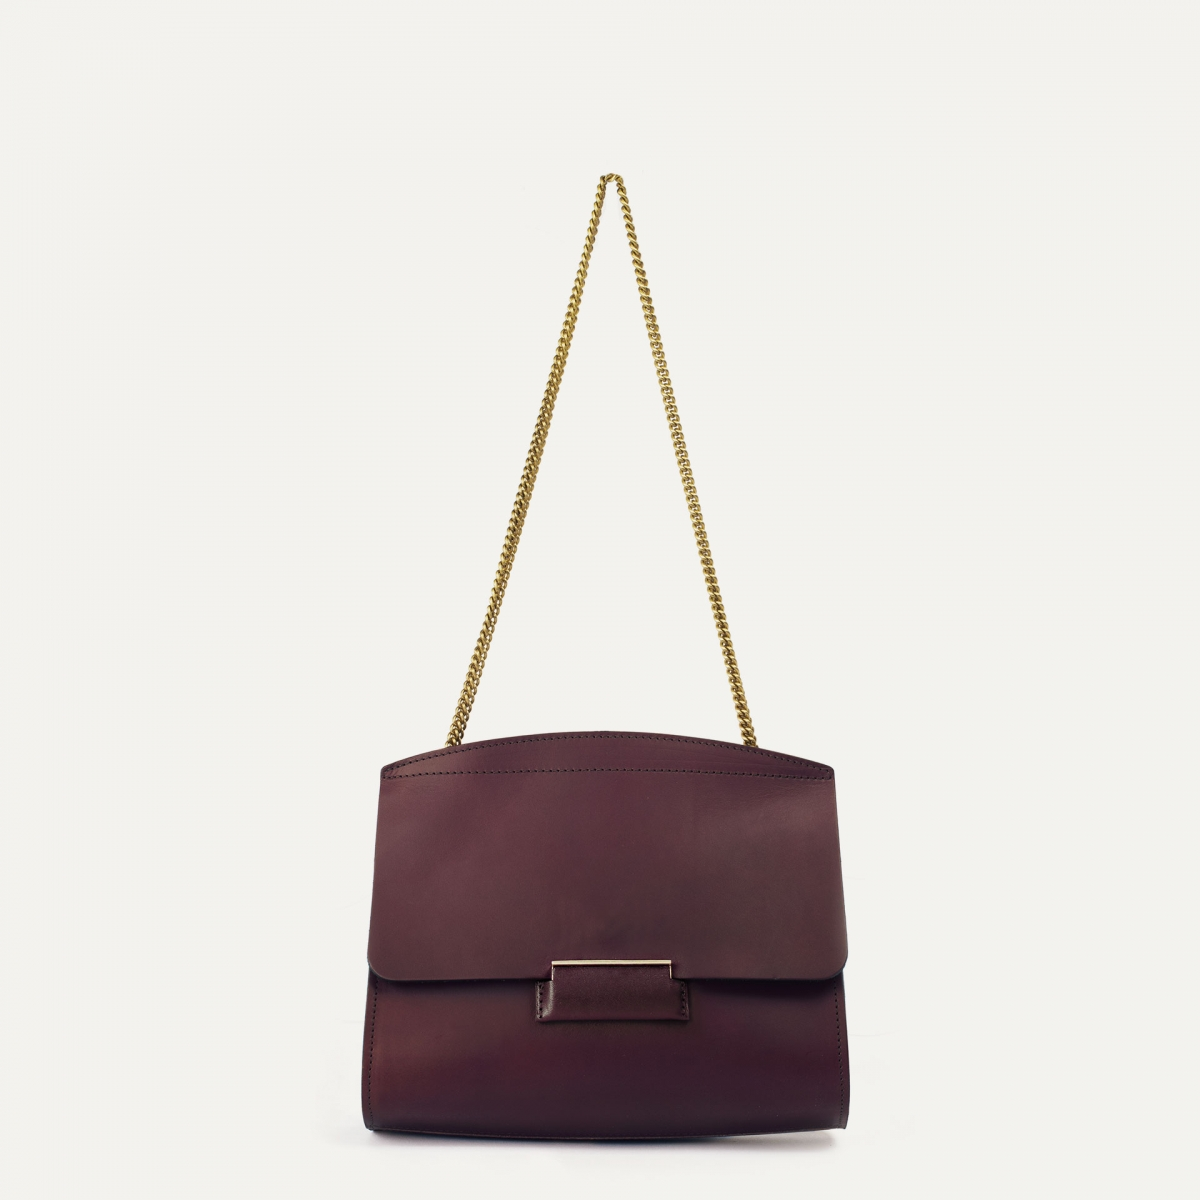 Origami S clutch bag - Peat (image n°1)